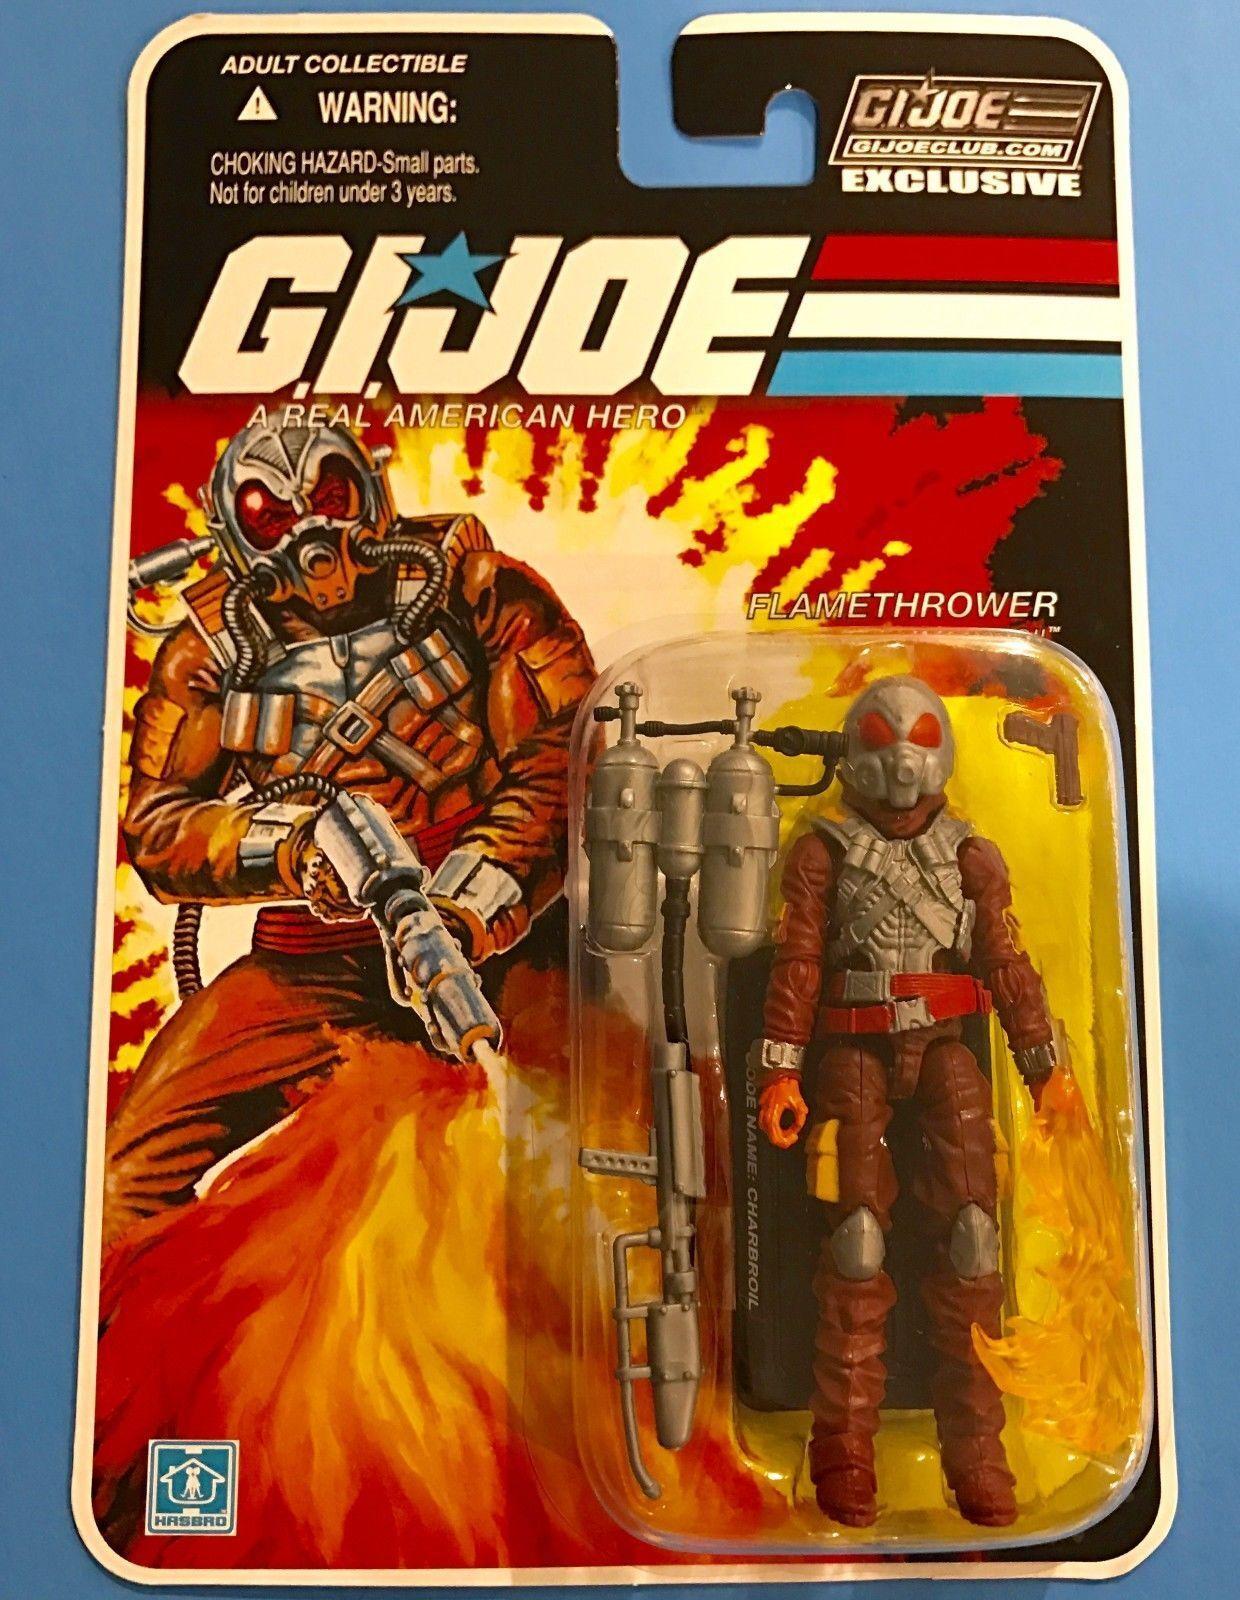 G.I.JOE EXCLUSIVE CLUB FSS 5.0  CHARBROIL - FLAMETHROWER